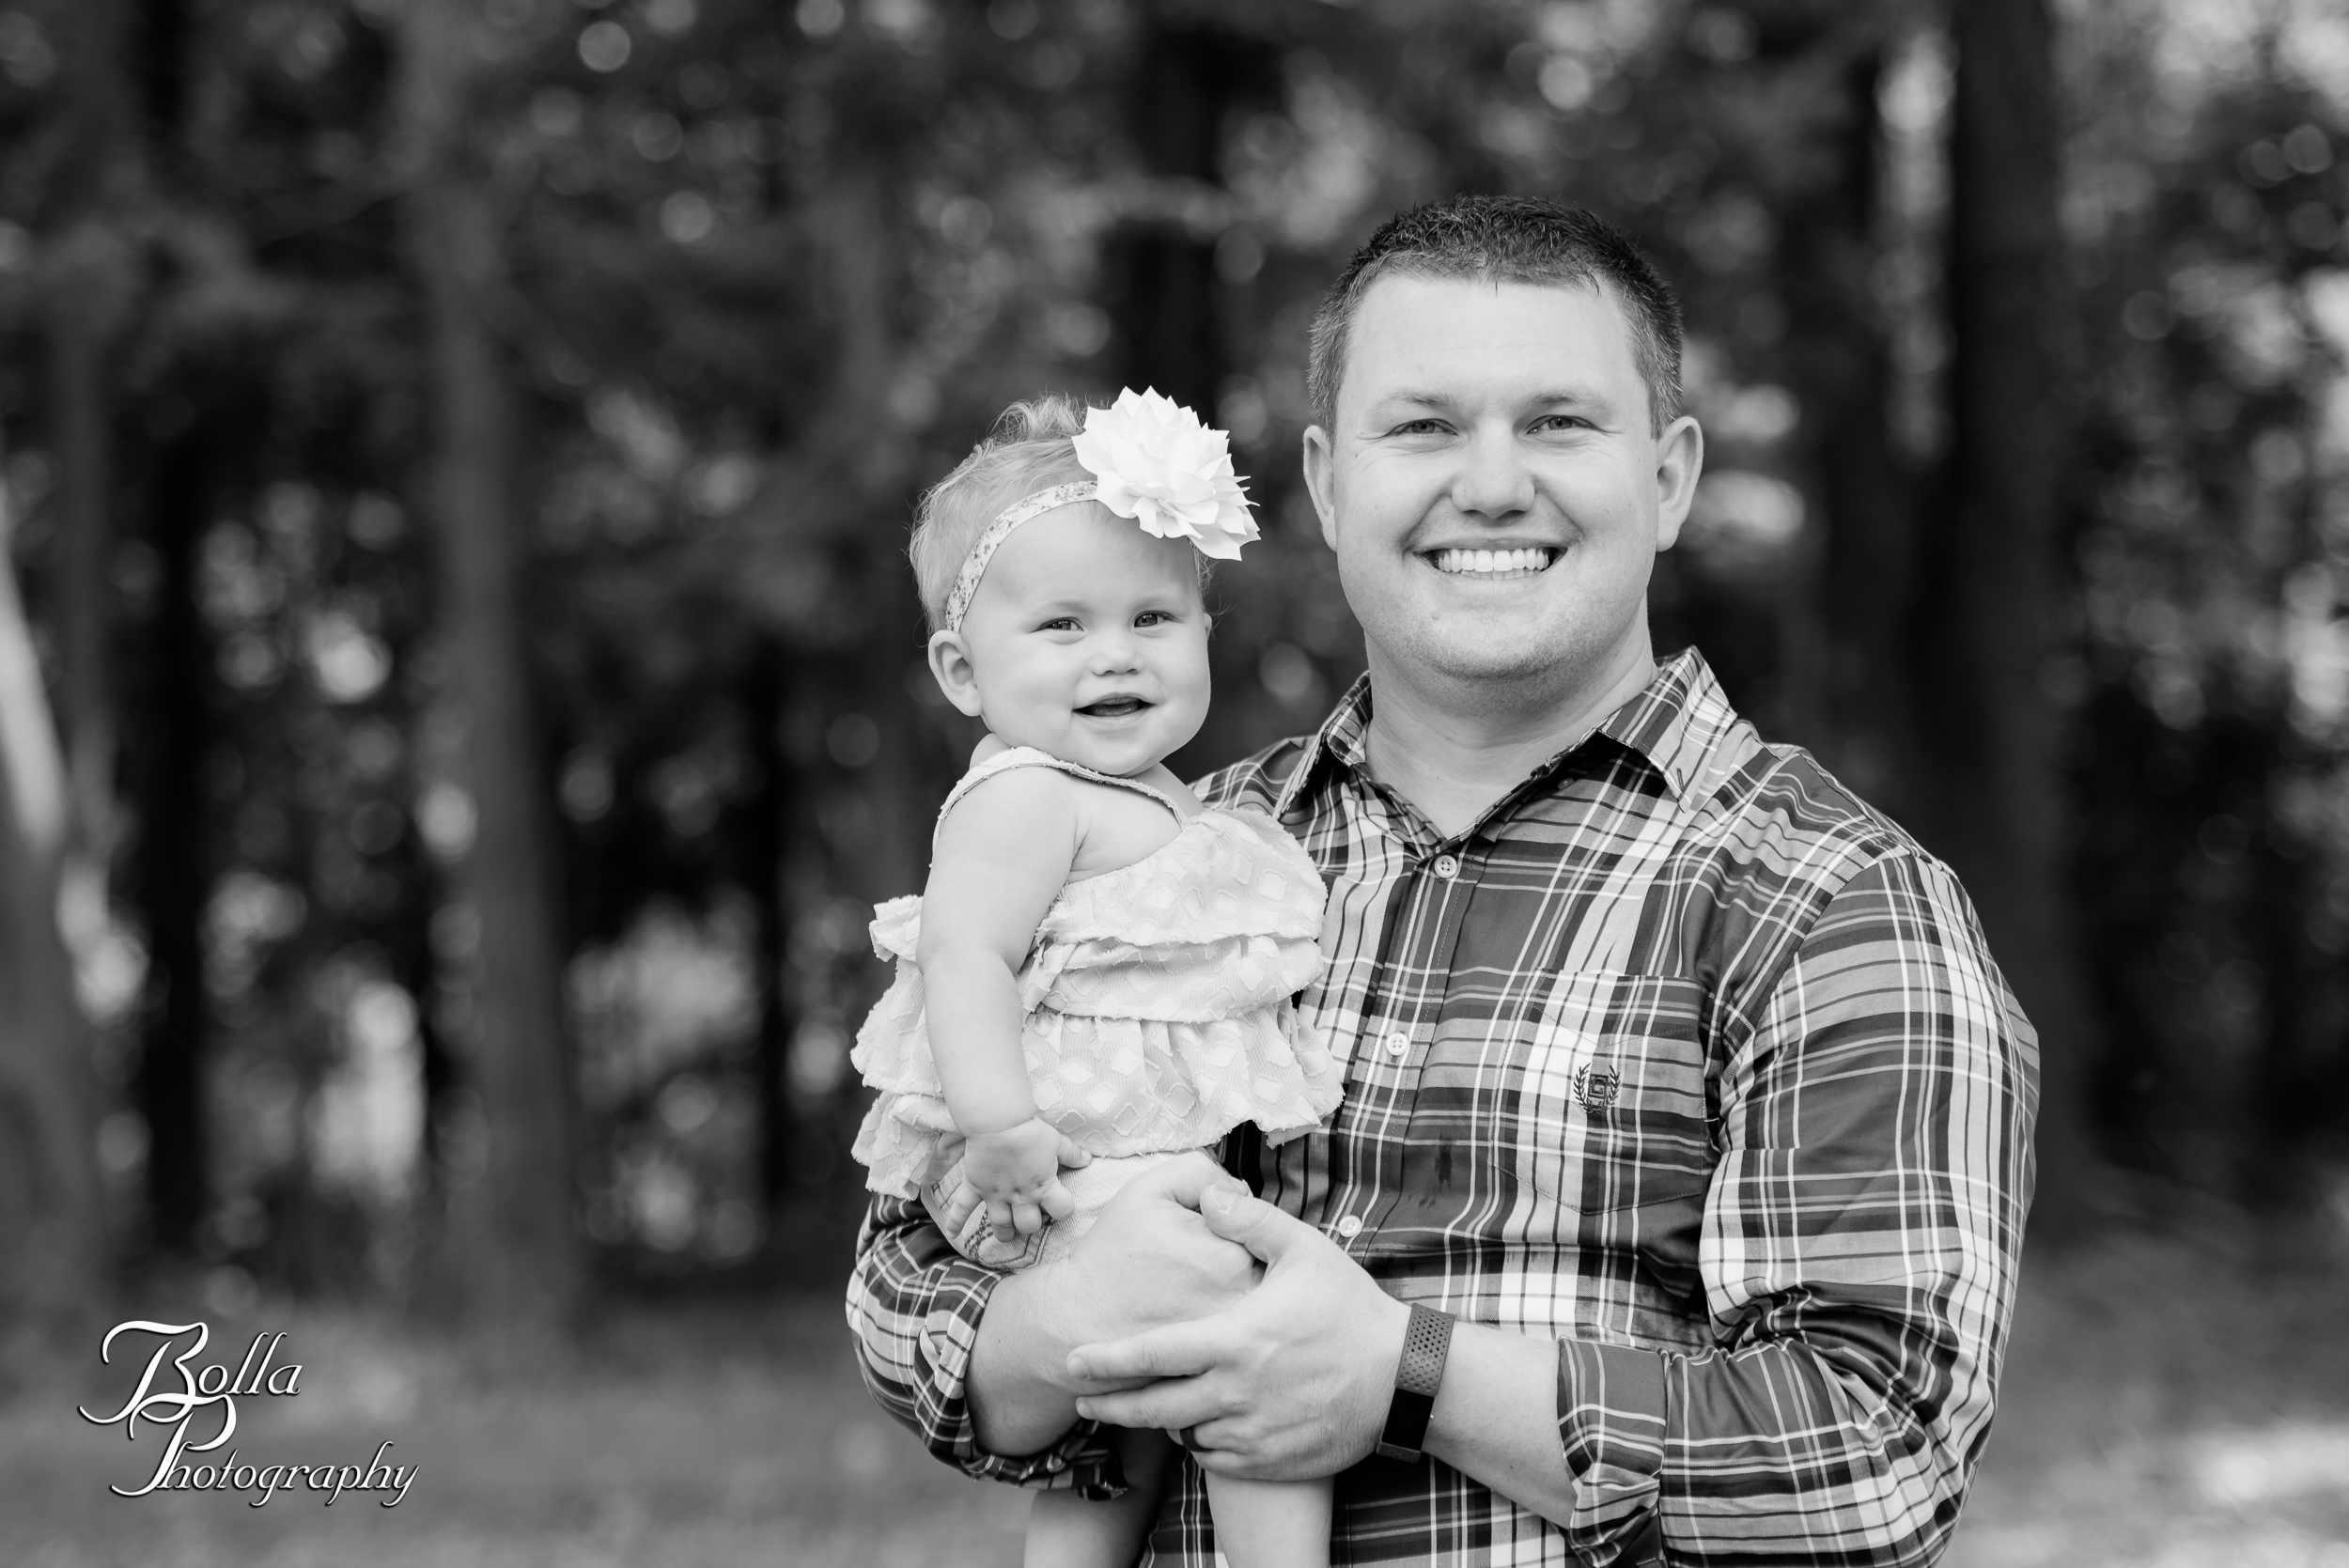 20170805_Bolla photography edwardsville wedding newborn baby photographer st louis weddings babies-2-2.jpg